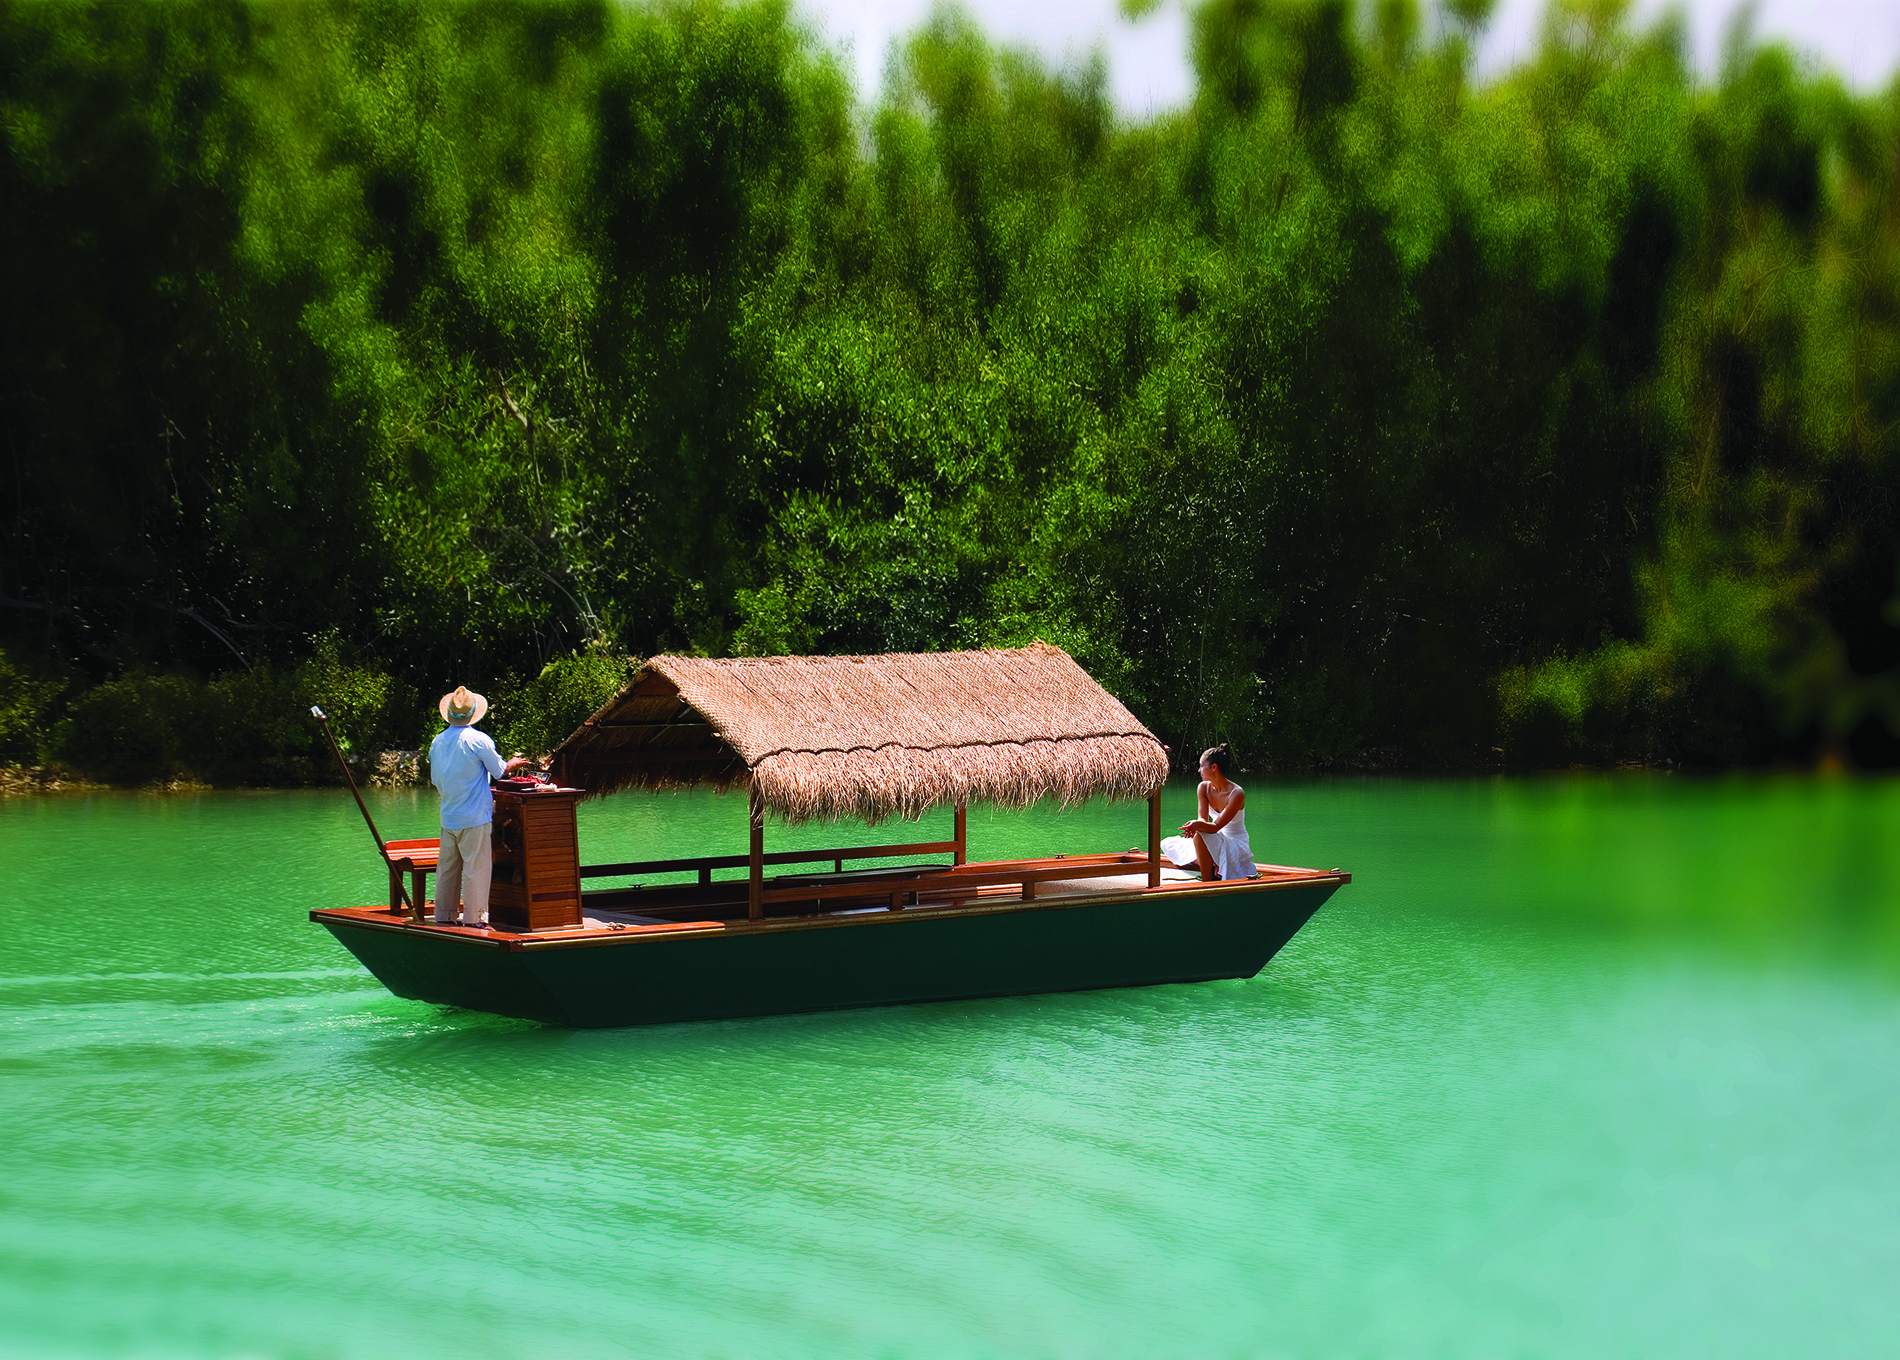 Hóspede aprecia travessia nos canais do Fairmont Mayakoba, na Riviera Maya